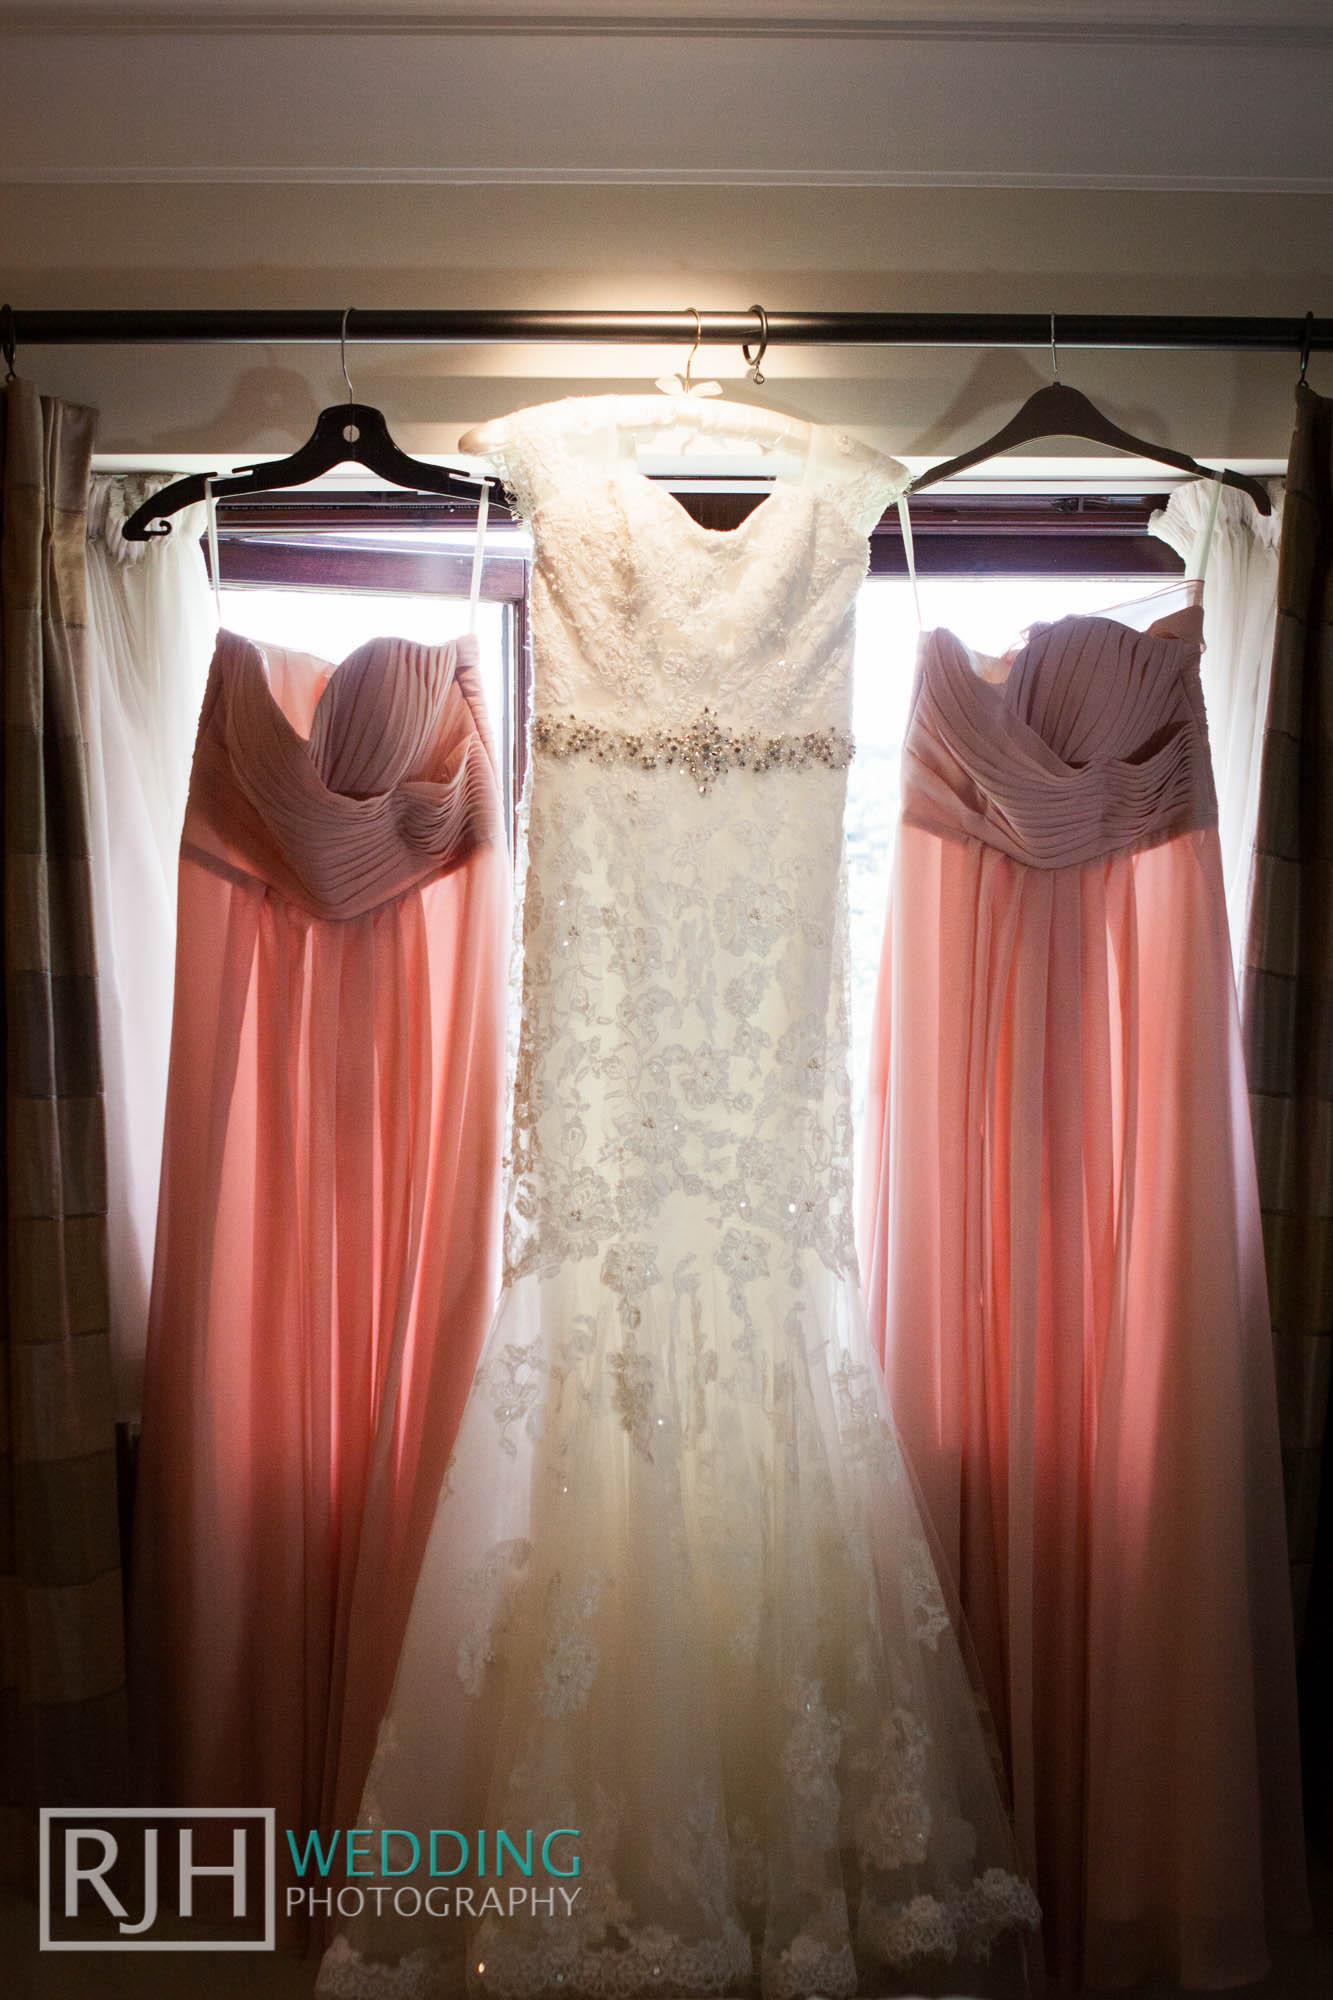 RJH Wedding Photography_Tankersley Manor Wedding_11.jpg